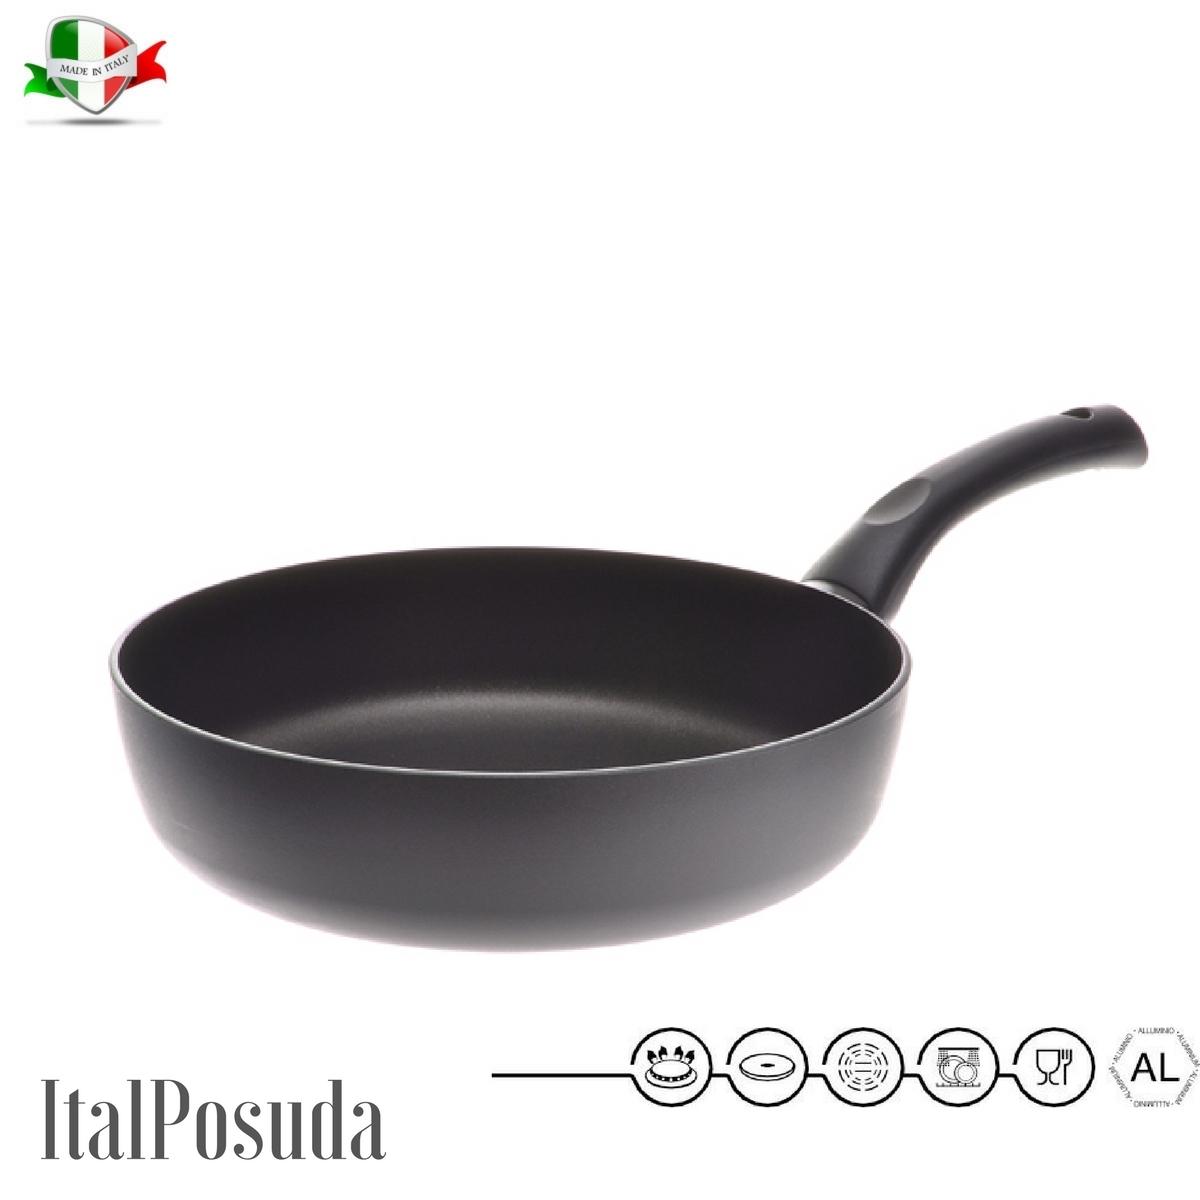 www.ital-posuda.ru. TIMA сотейник 26 см